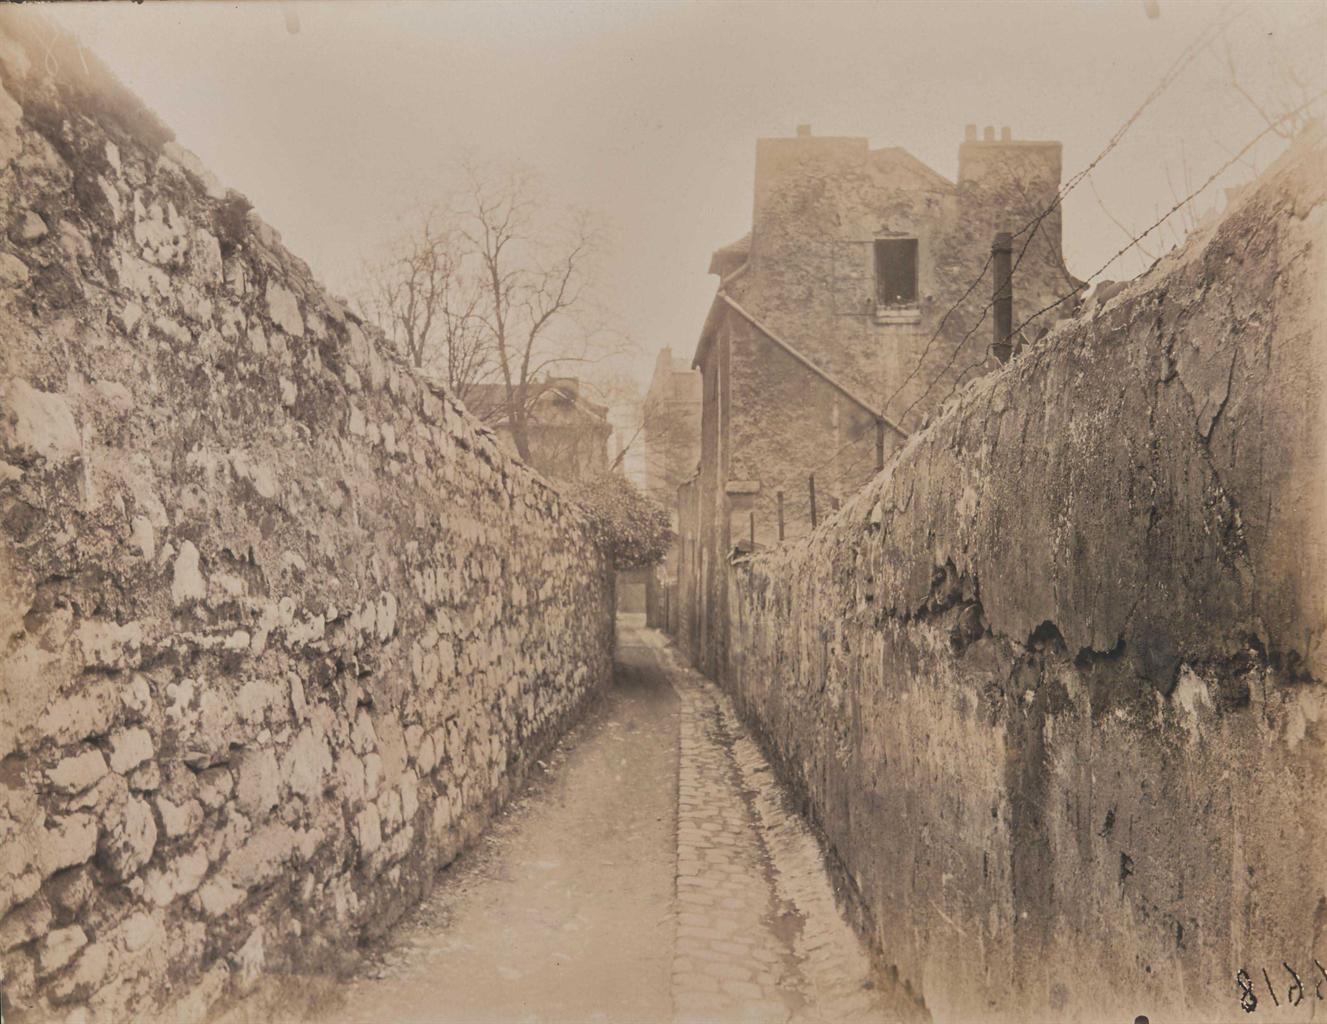 Eugene Atget-Ruelle des Reculettes, Paris-1920